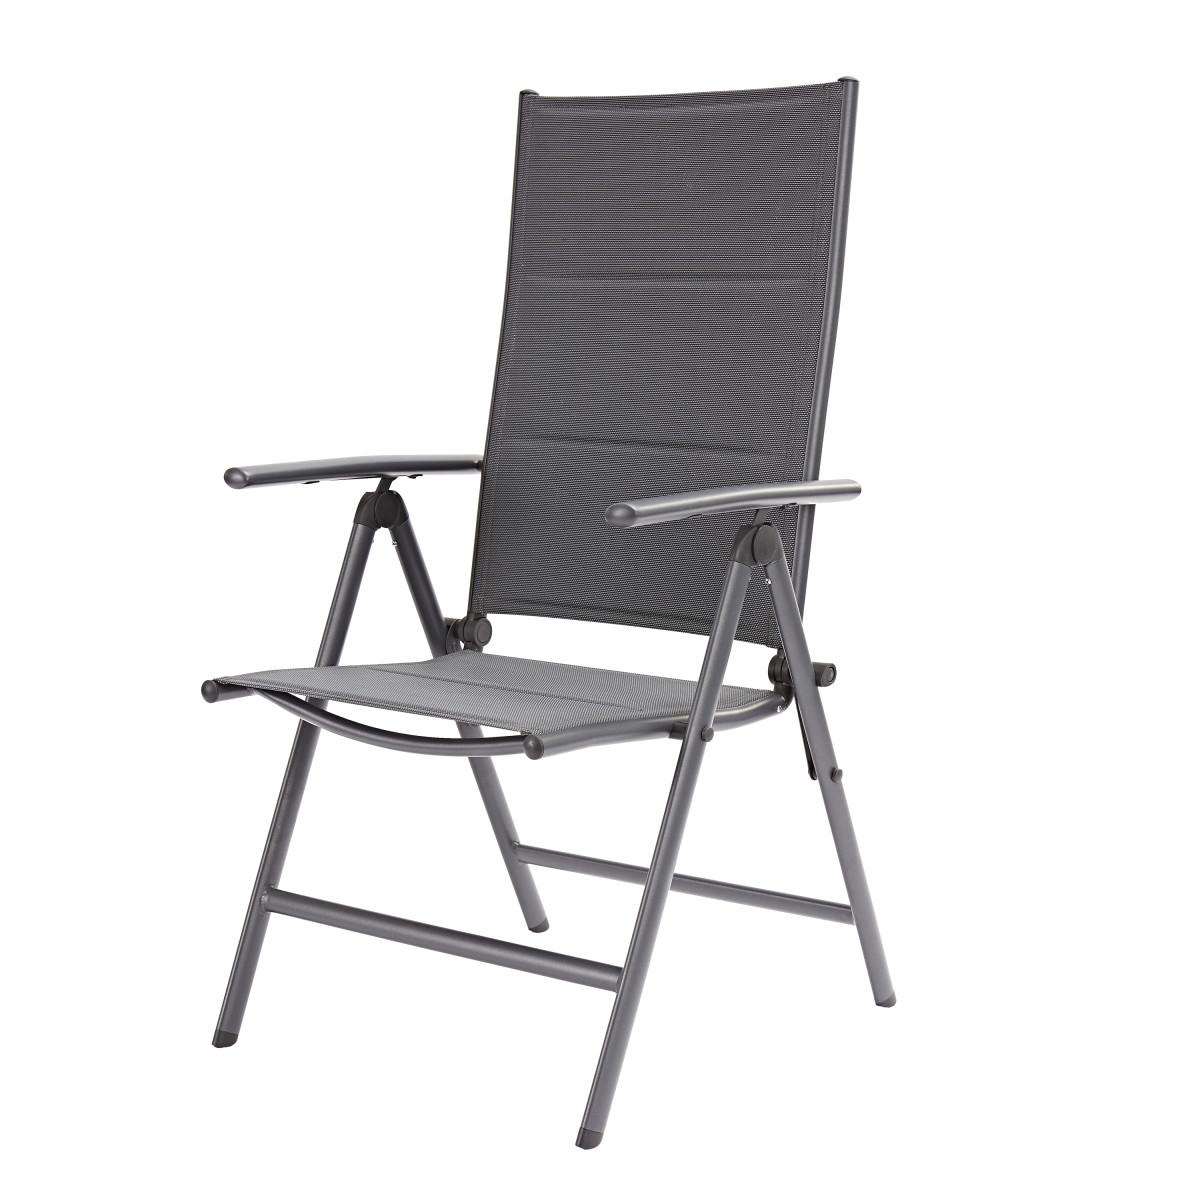 Кресло садовое Naterial Orion темно-серый